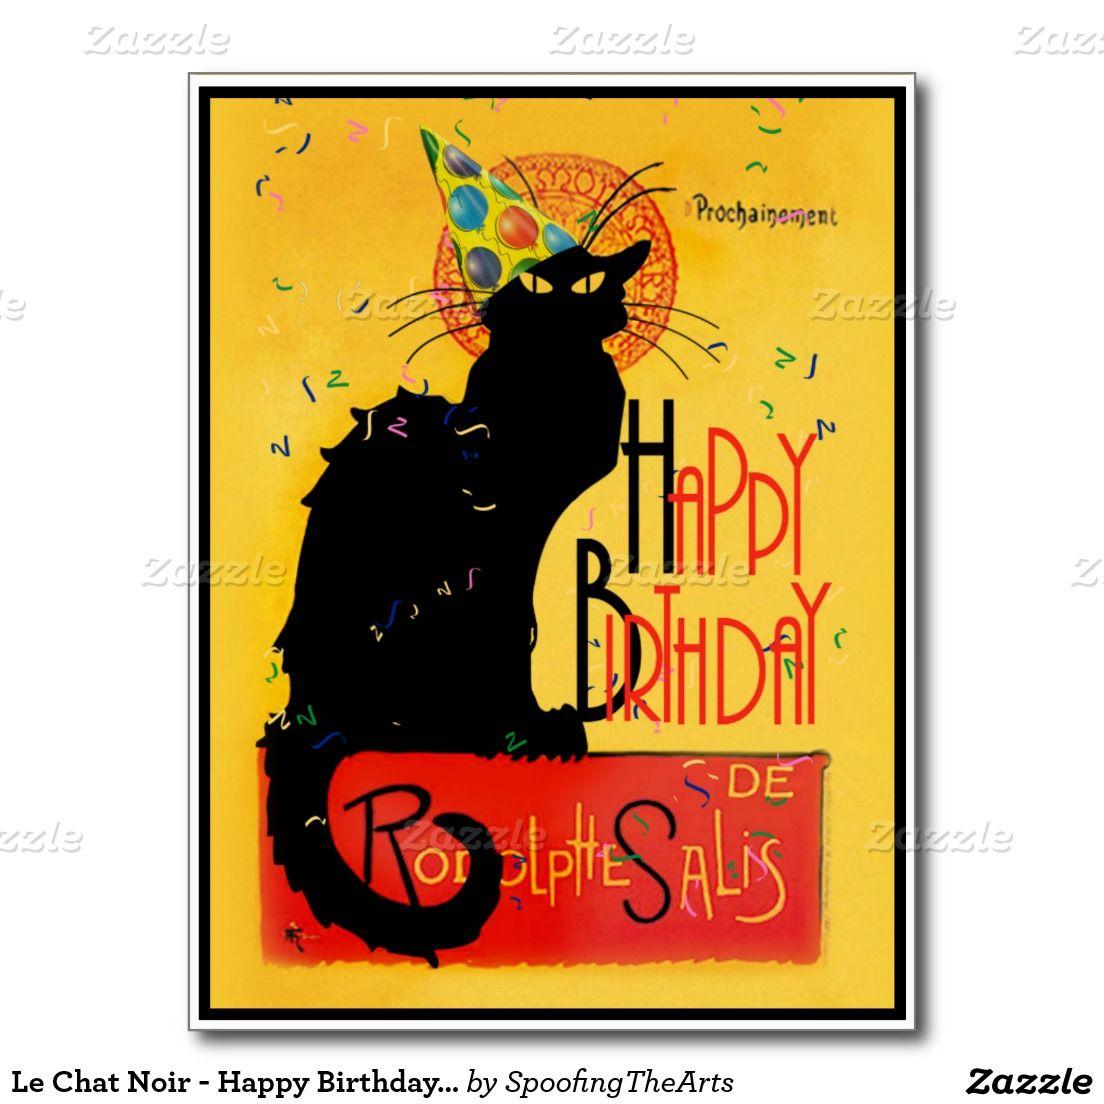 Le Chat Noir Happy Birthday Greetings Postcard Zazzle Com Chat Noir Happy Birthday Art Le Chat Noir